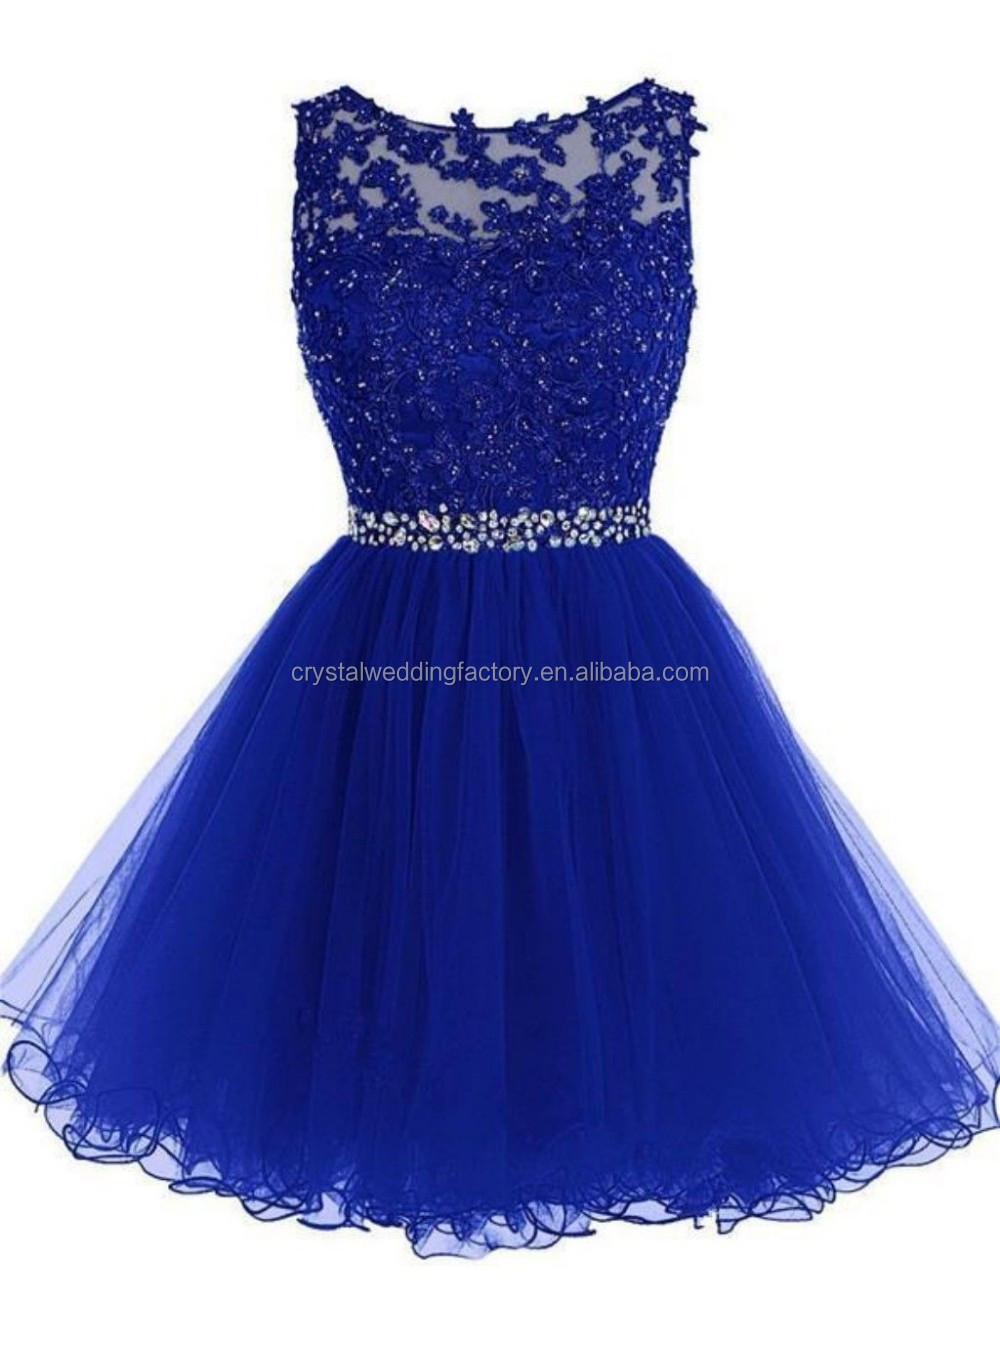 Appliques Ruffles Tiered Hollow Ball Dress Short Prom Vestido Mini ...